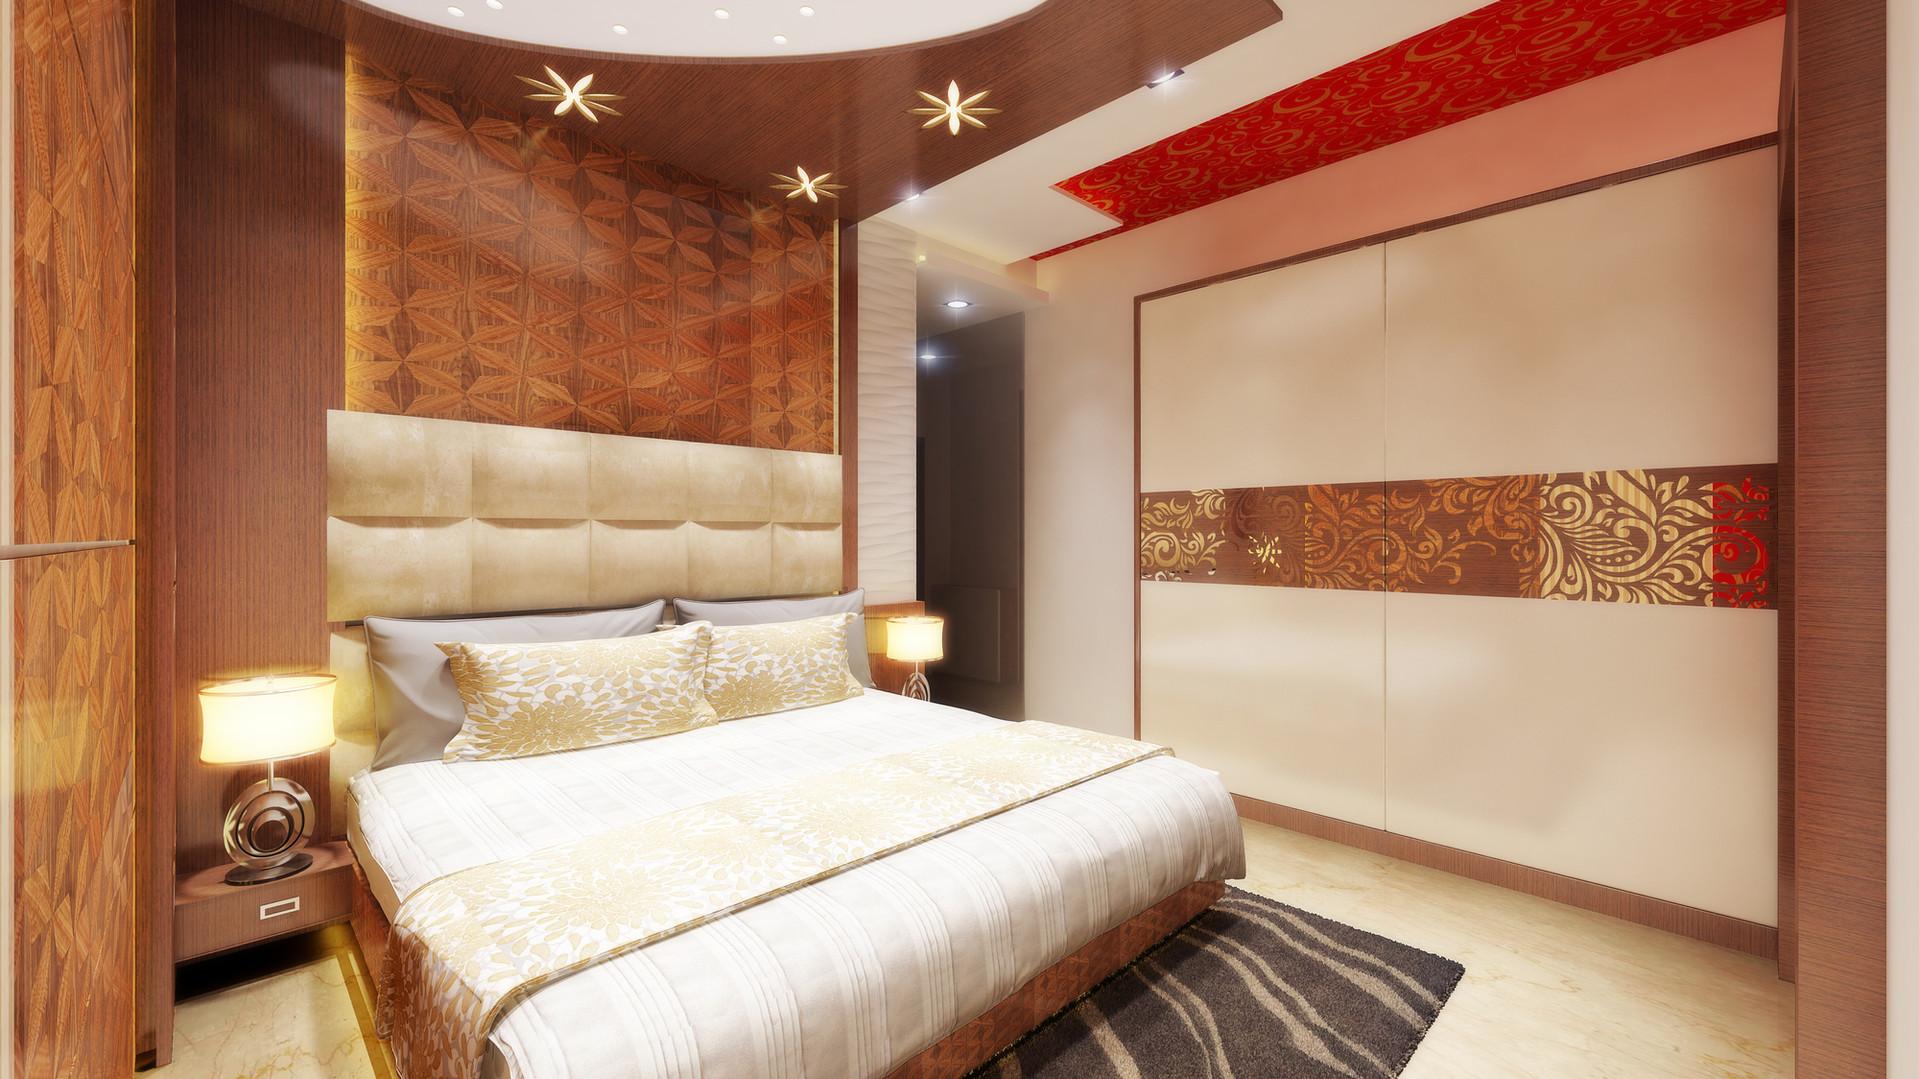 bedroom1.2.jpg